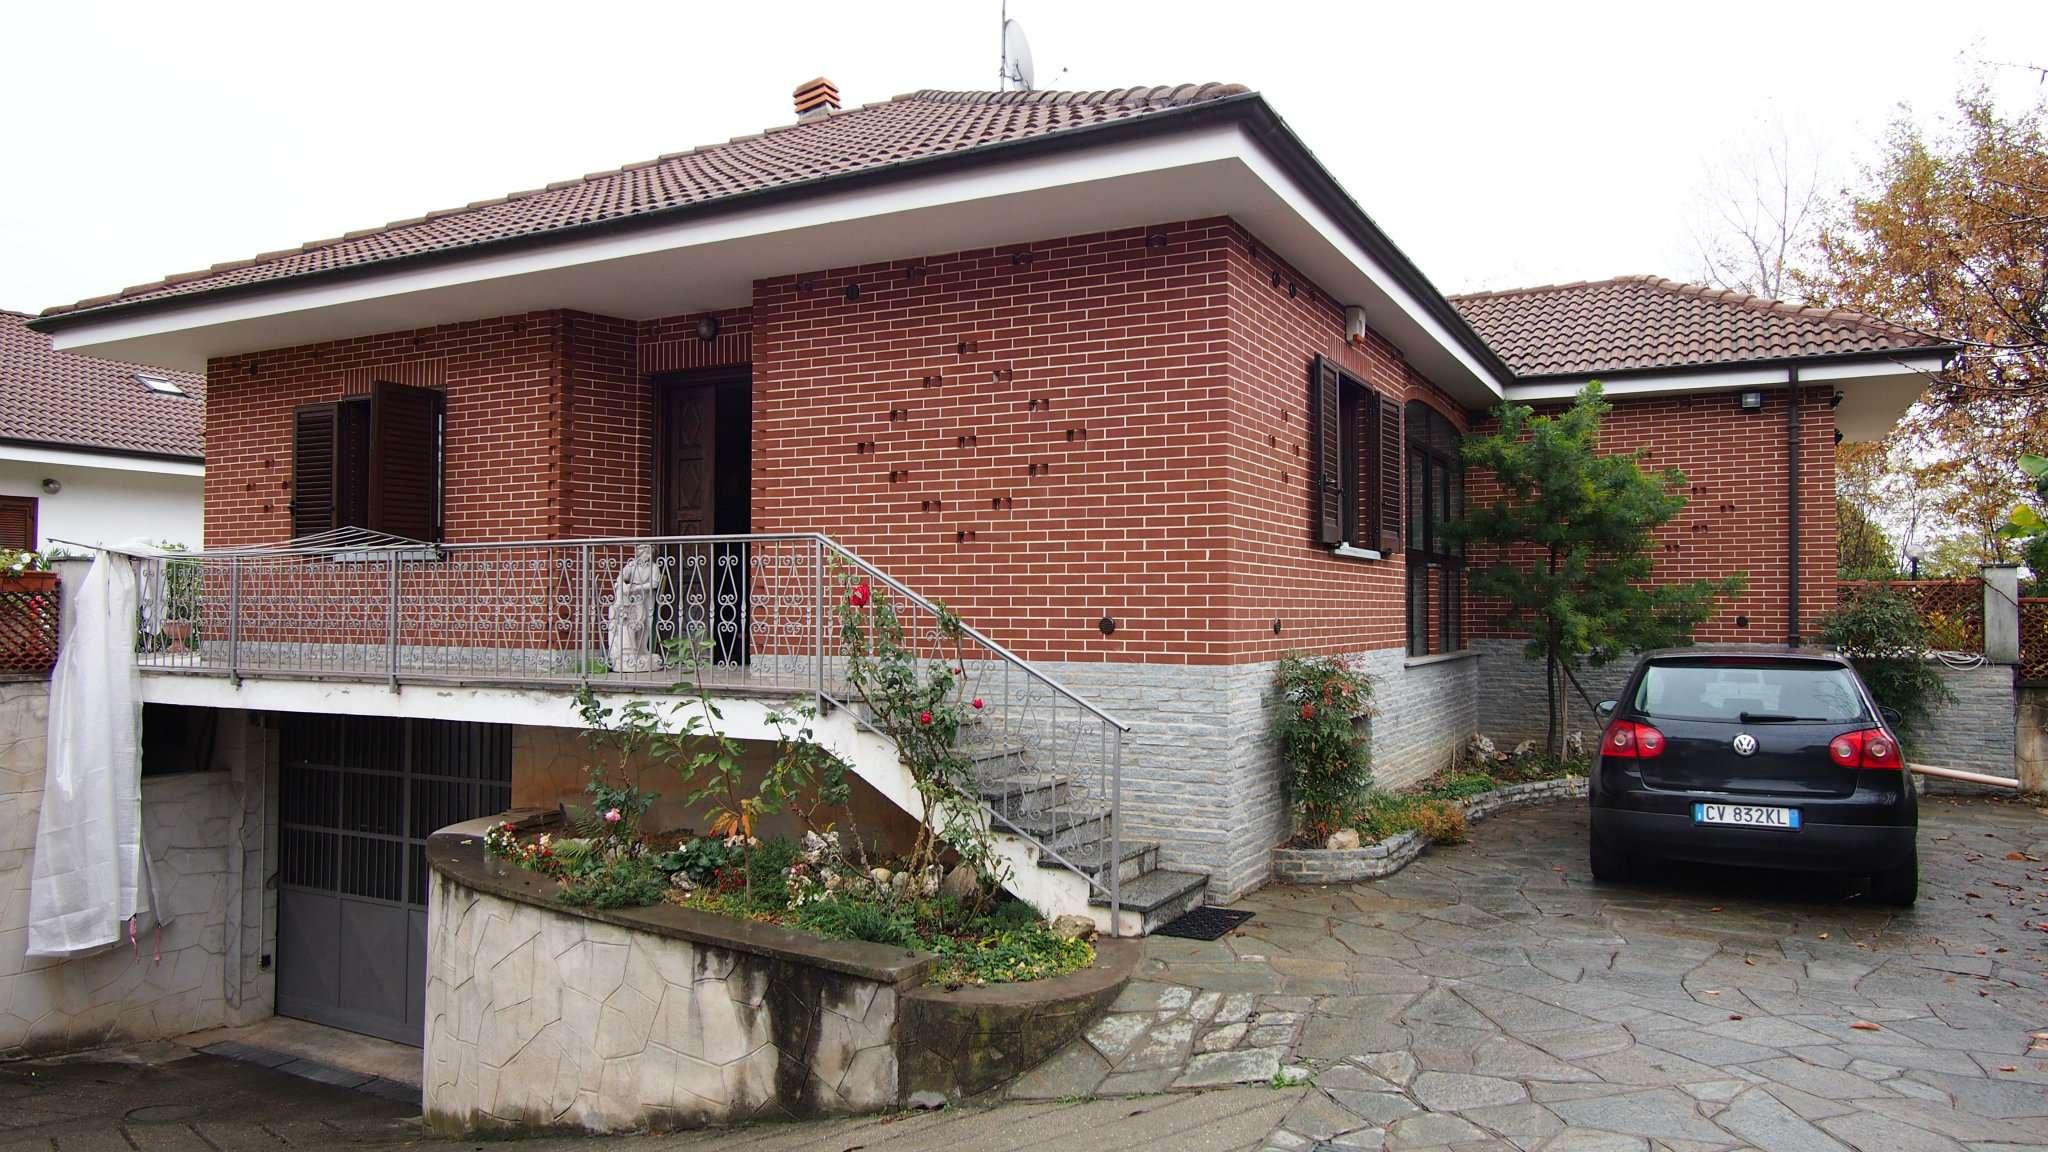 Casa indipendente in Vendita a Bruino: 5 locali, 350 mq